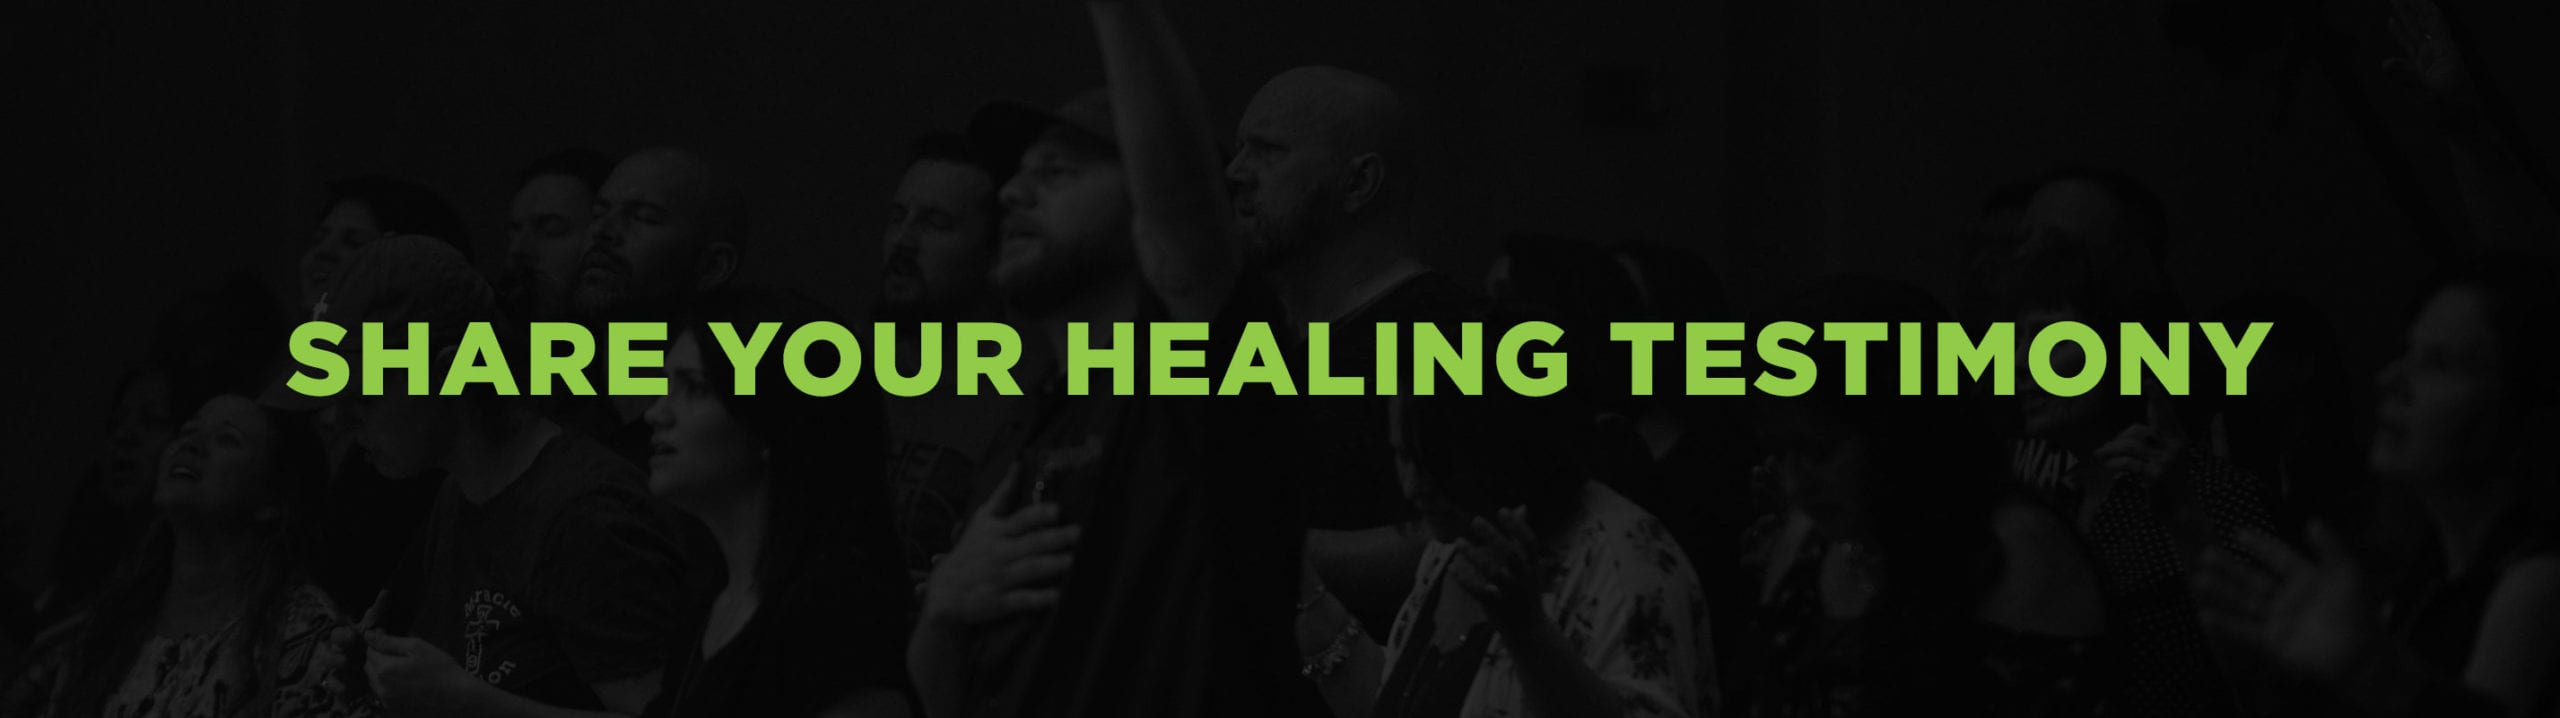 Share your healing testimony